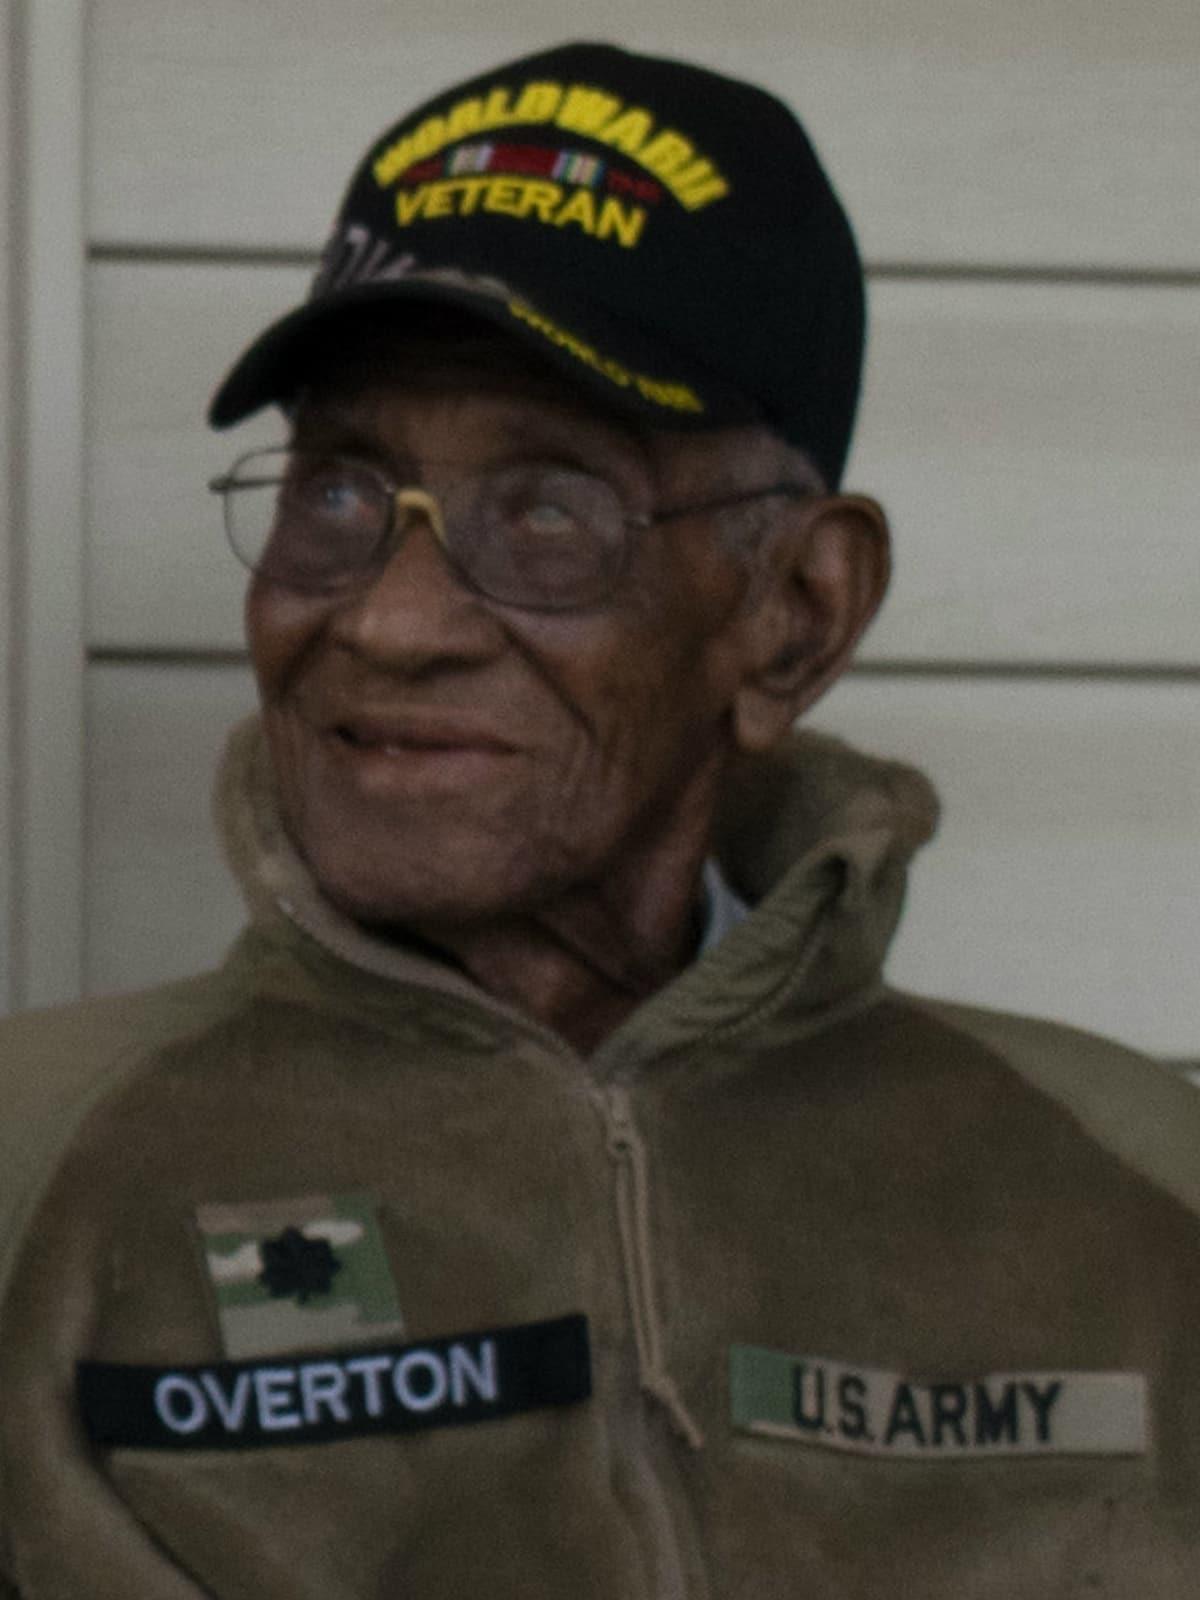 Richard Overton World War II vet